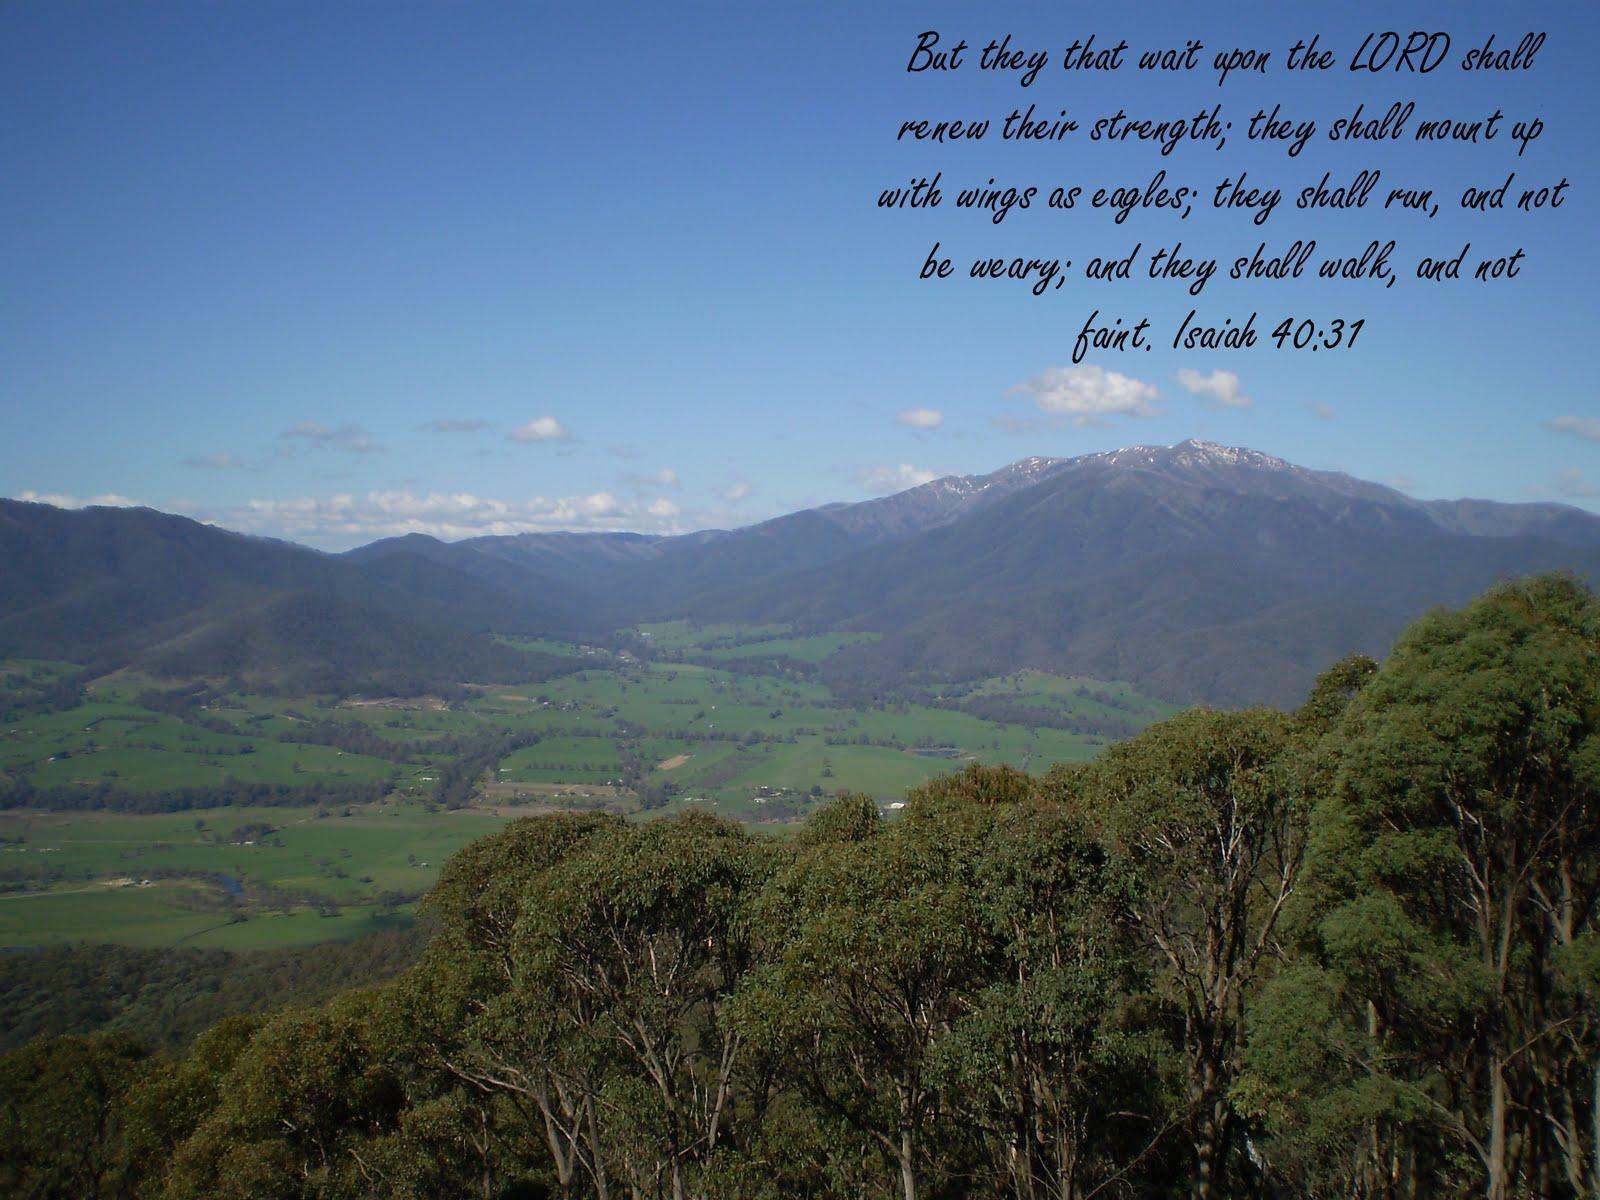 Feel My Love Quotes Wallpaper Kjv Bible Wallpapers Isaiah 40 31